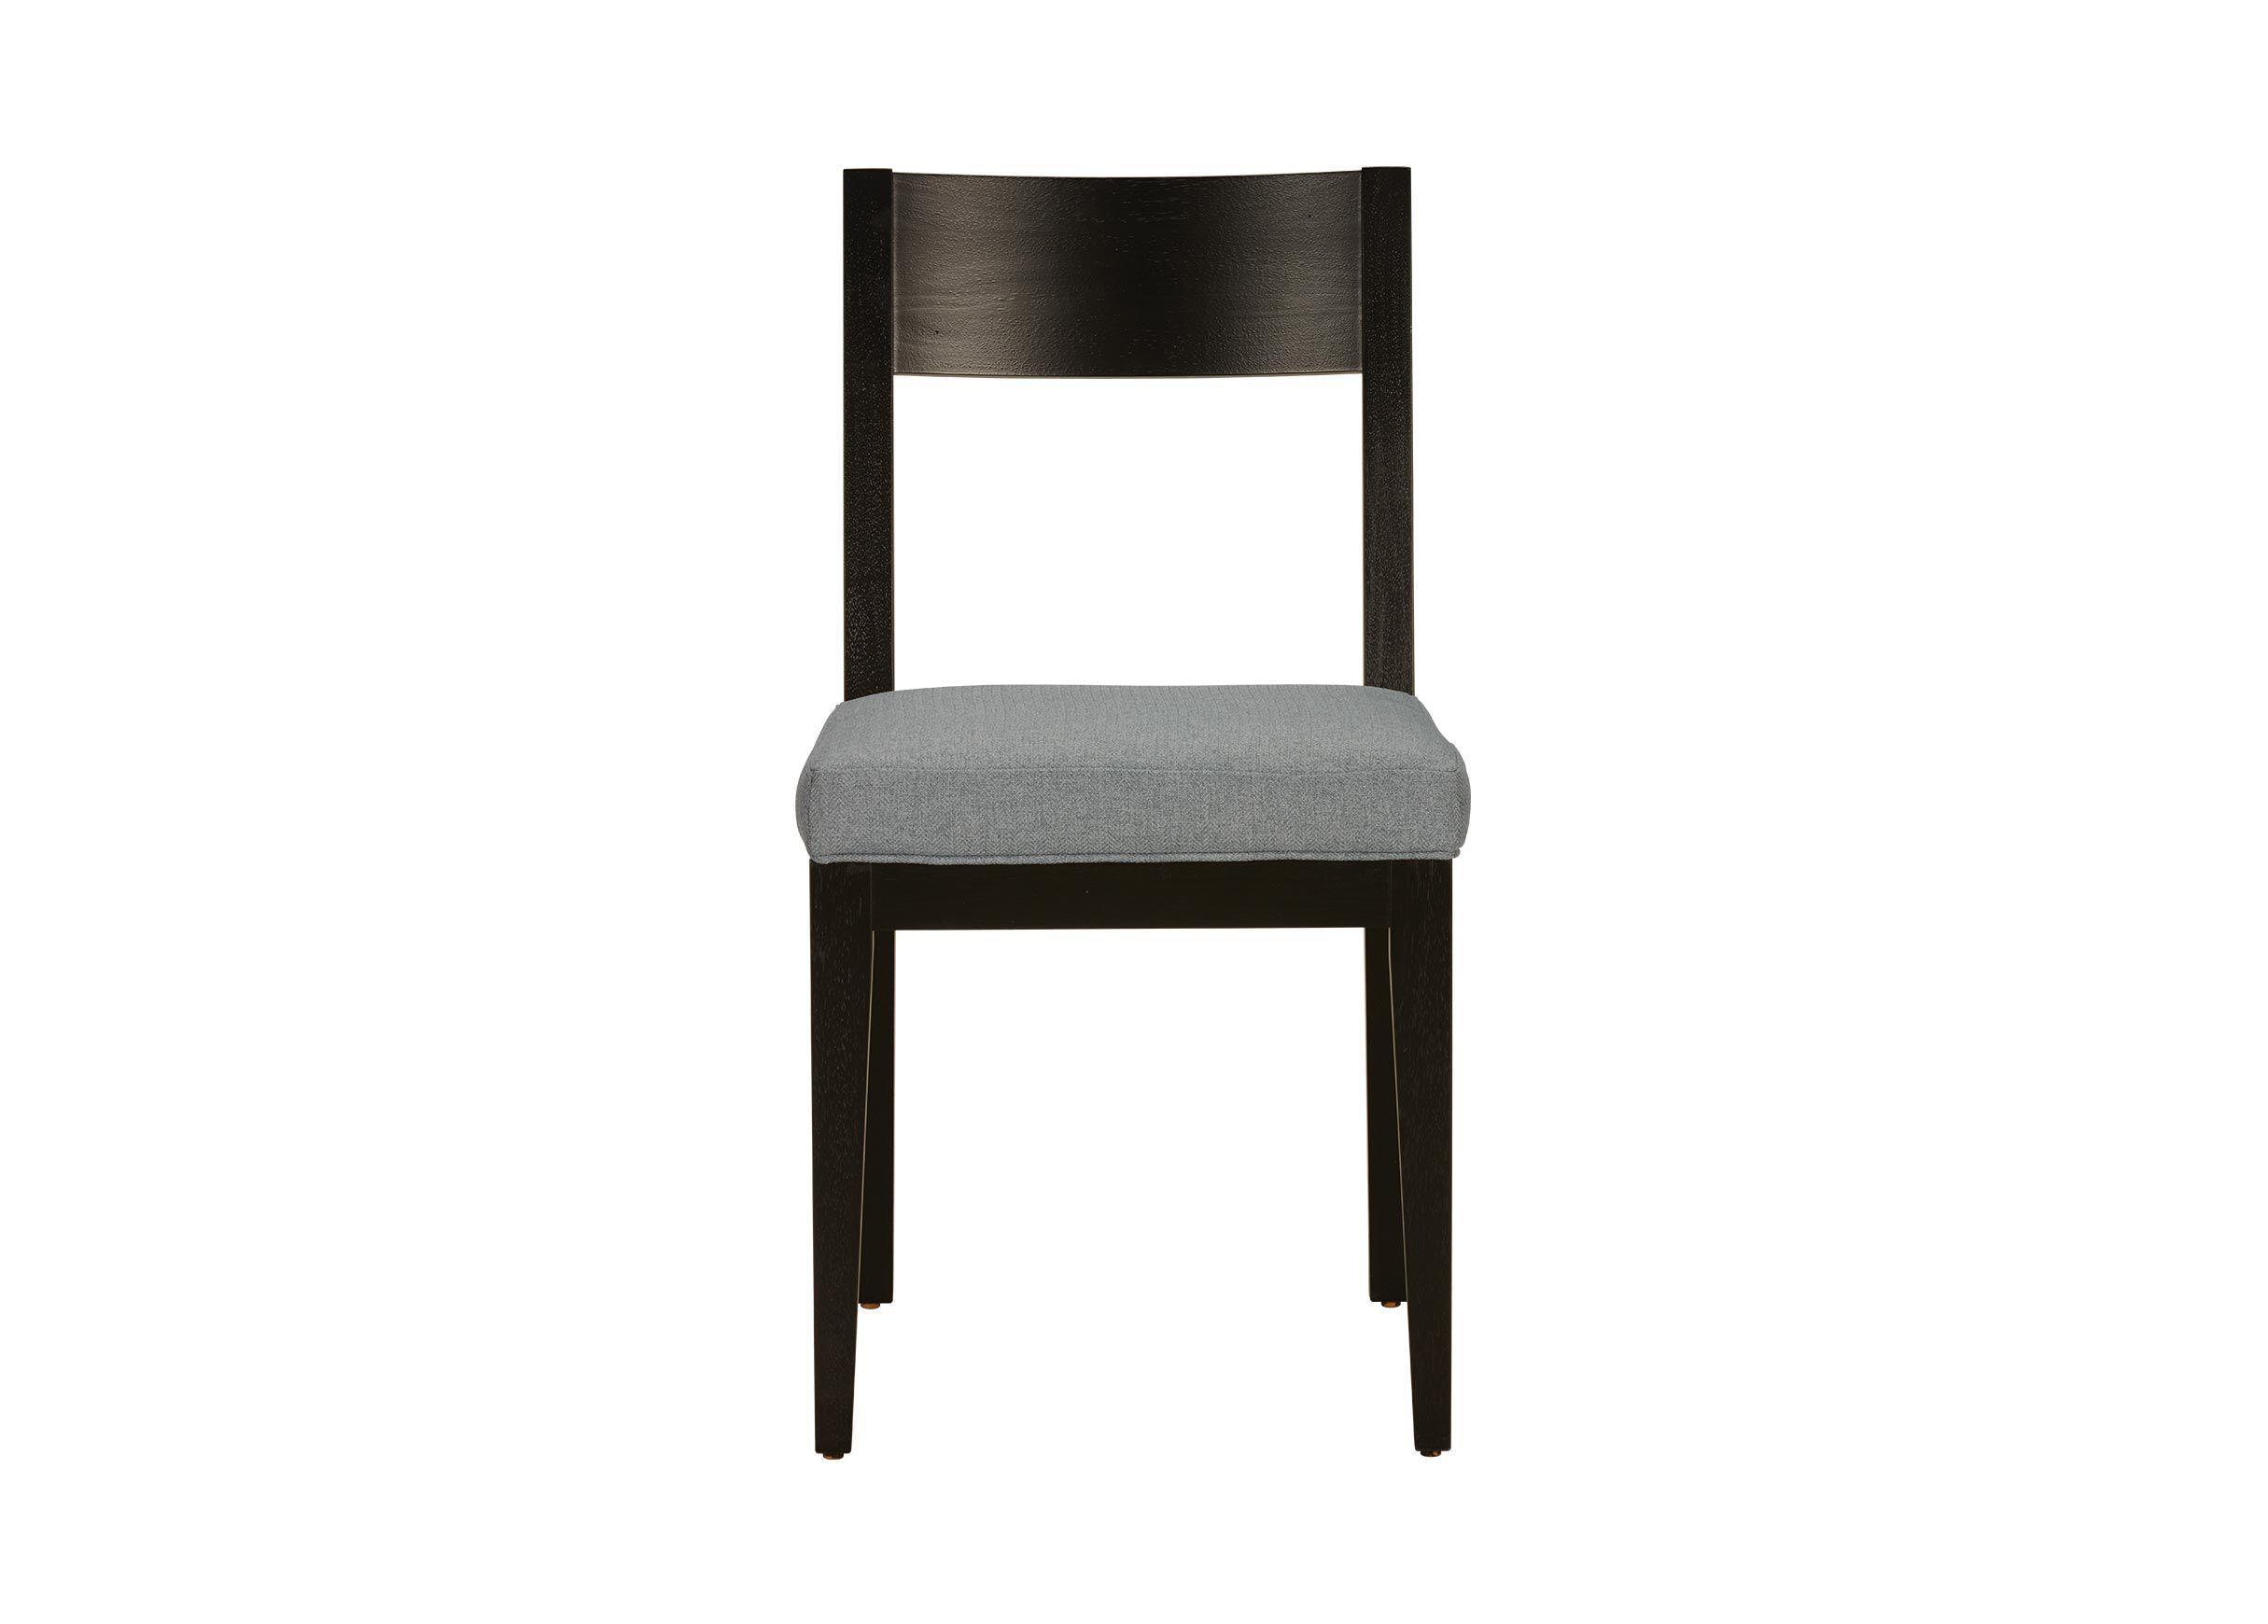 Krain Curved Back Upholstered Dining Side Chair | Ethan Allen | Ethan Allen